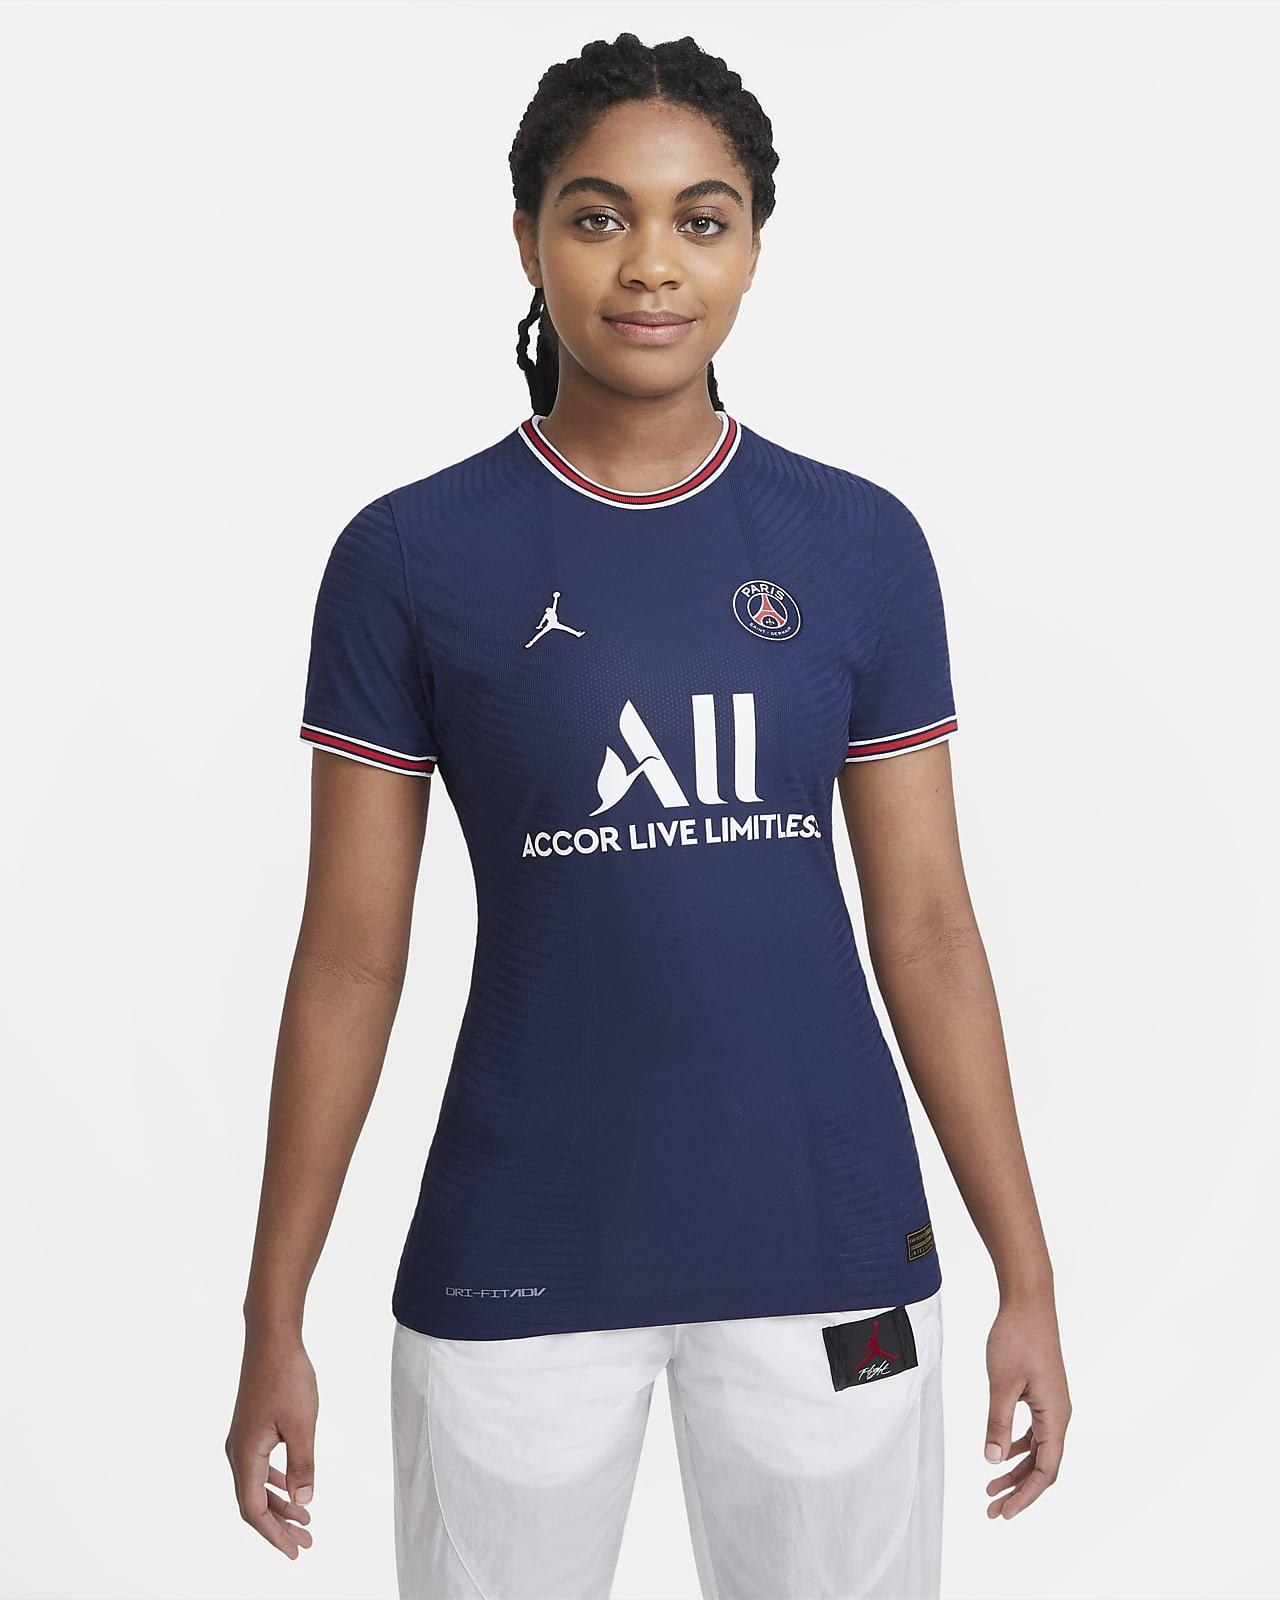 Camiseta de fútbol Nike Dri-FIT ADV para mujer Paris Saint-Germain 2021/22 Match Home